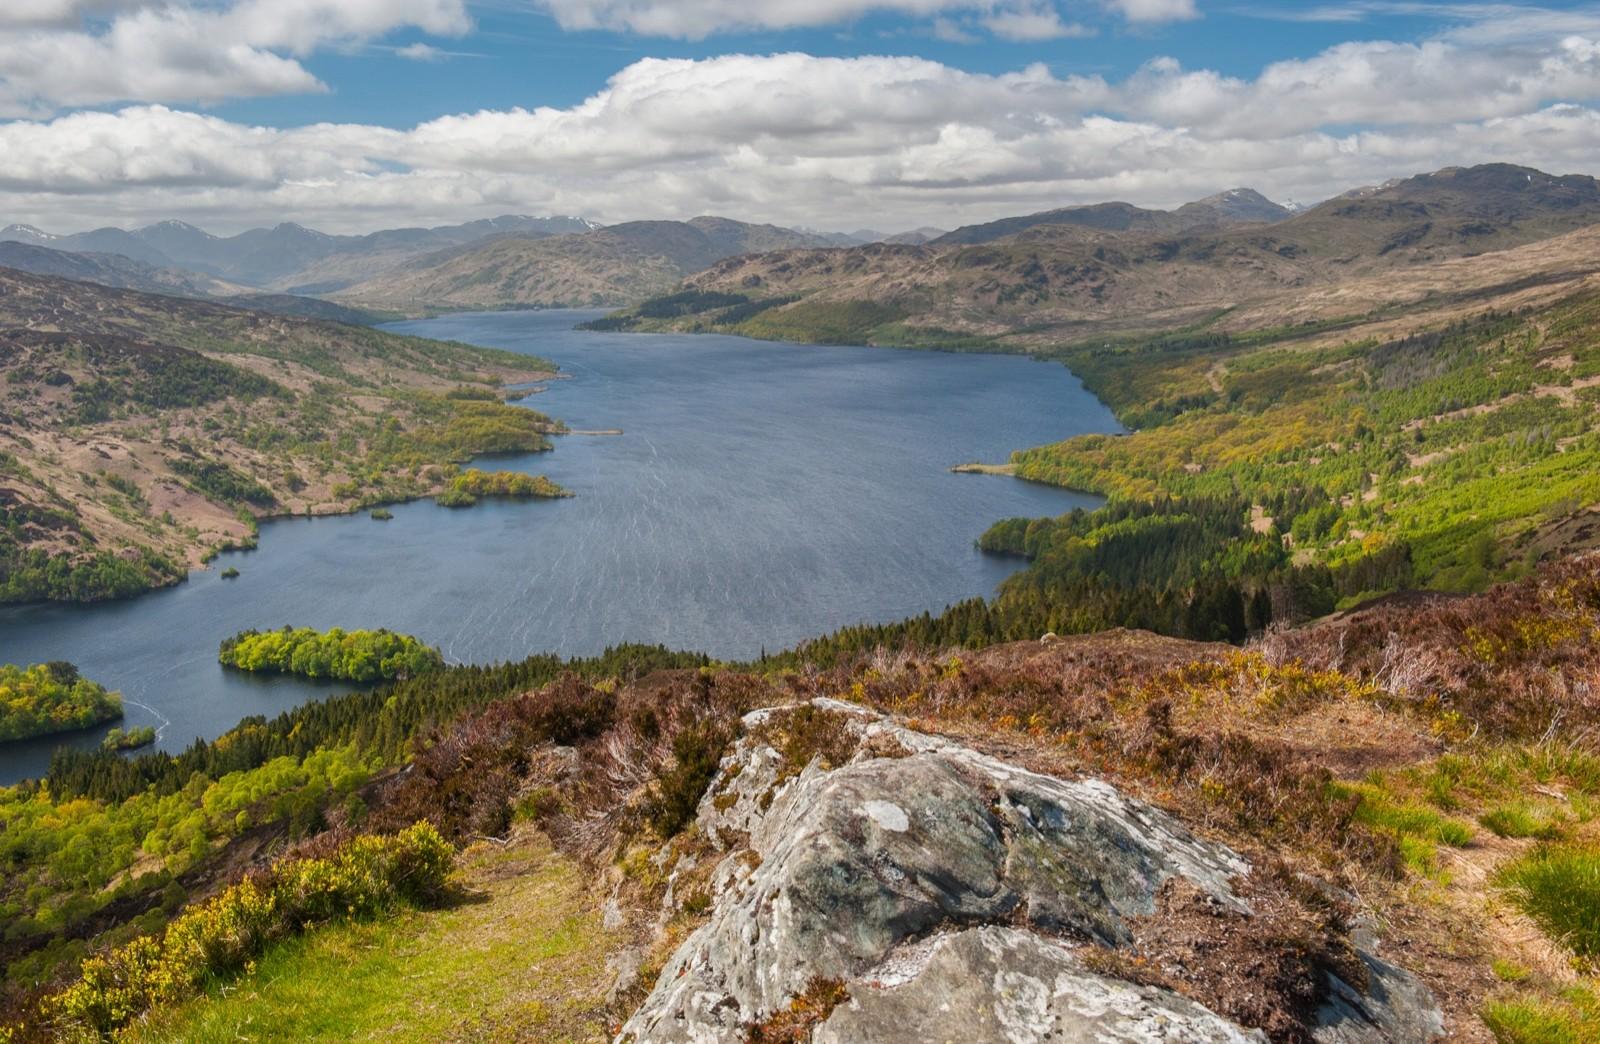 Loch-Katrine-from-above-cc4d30c